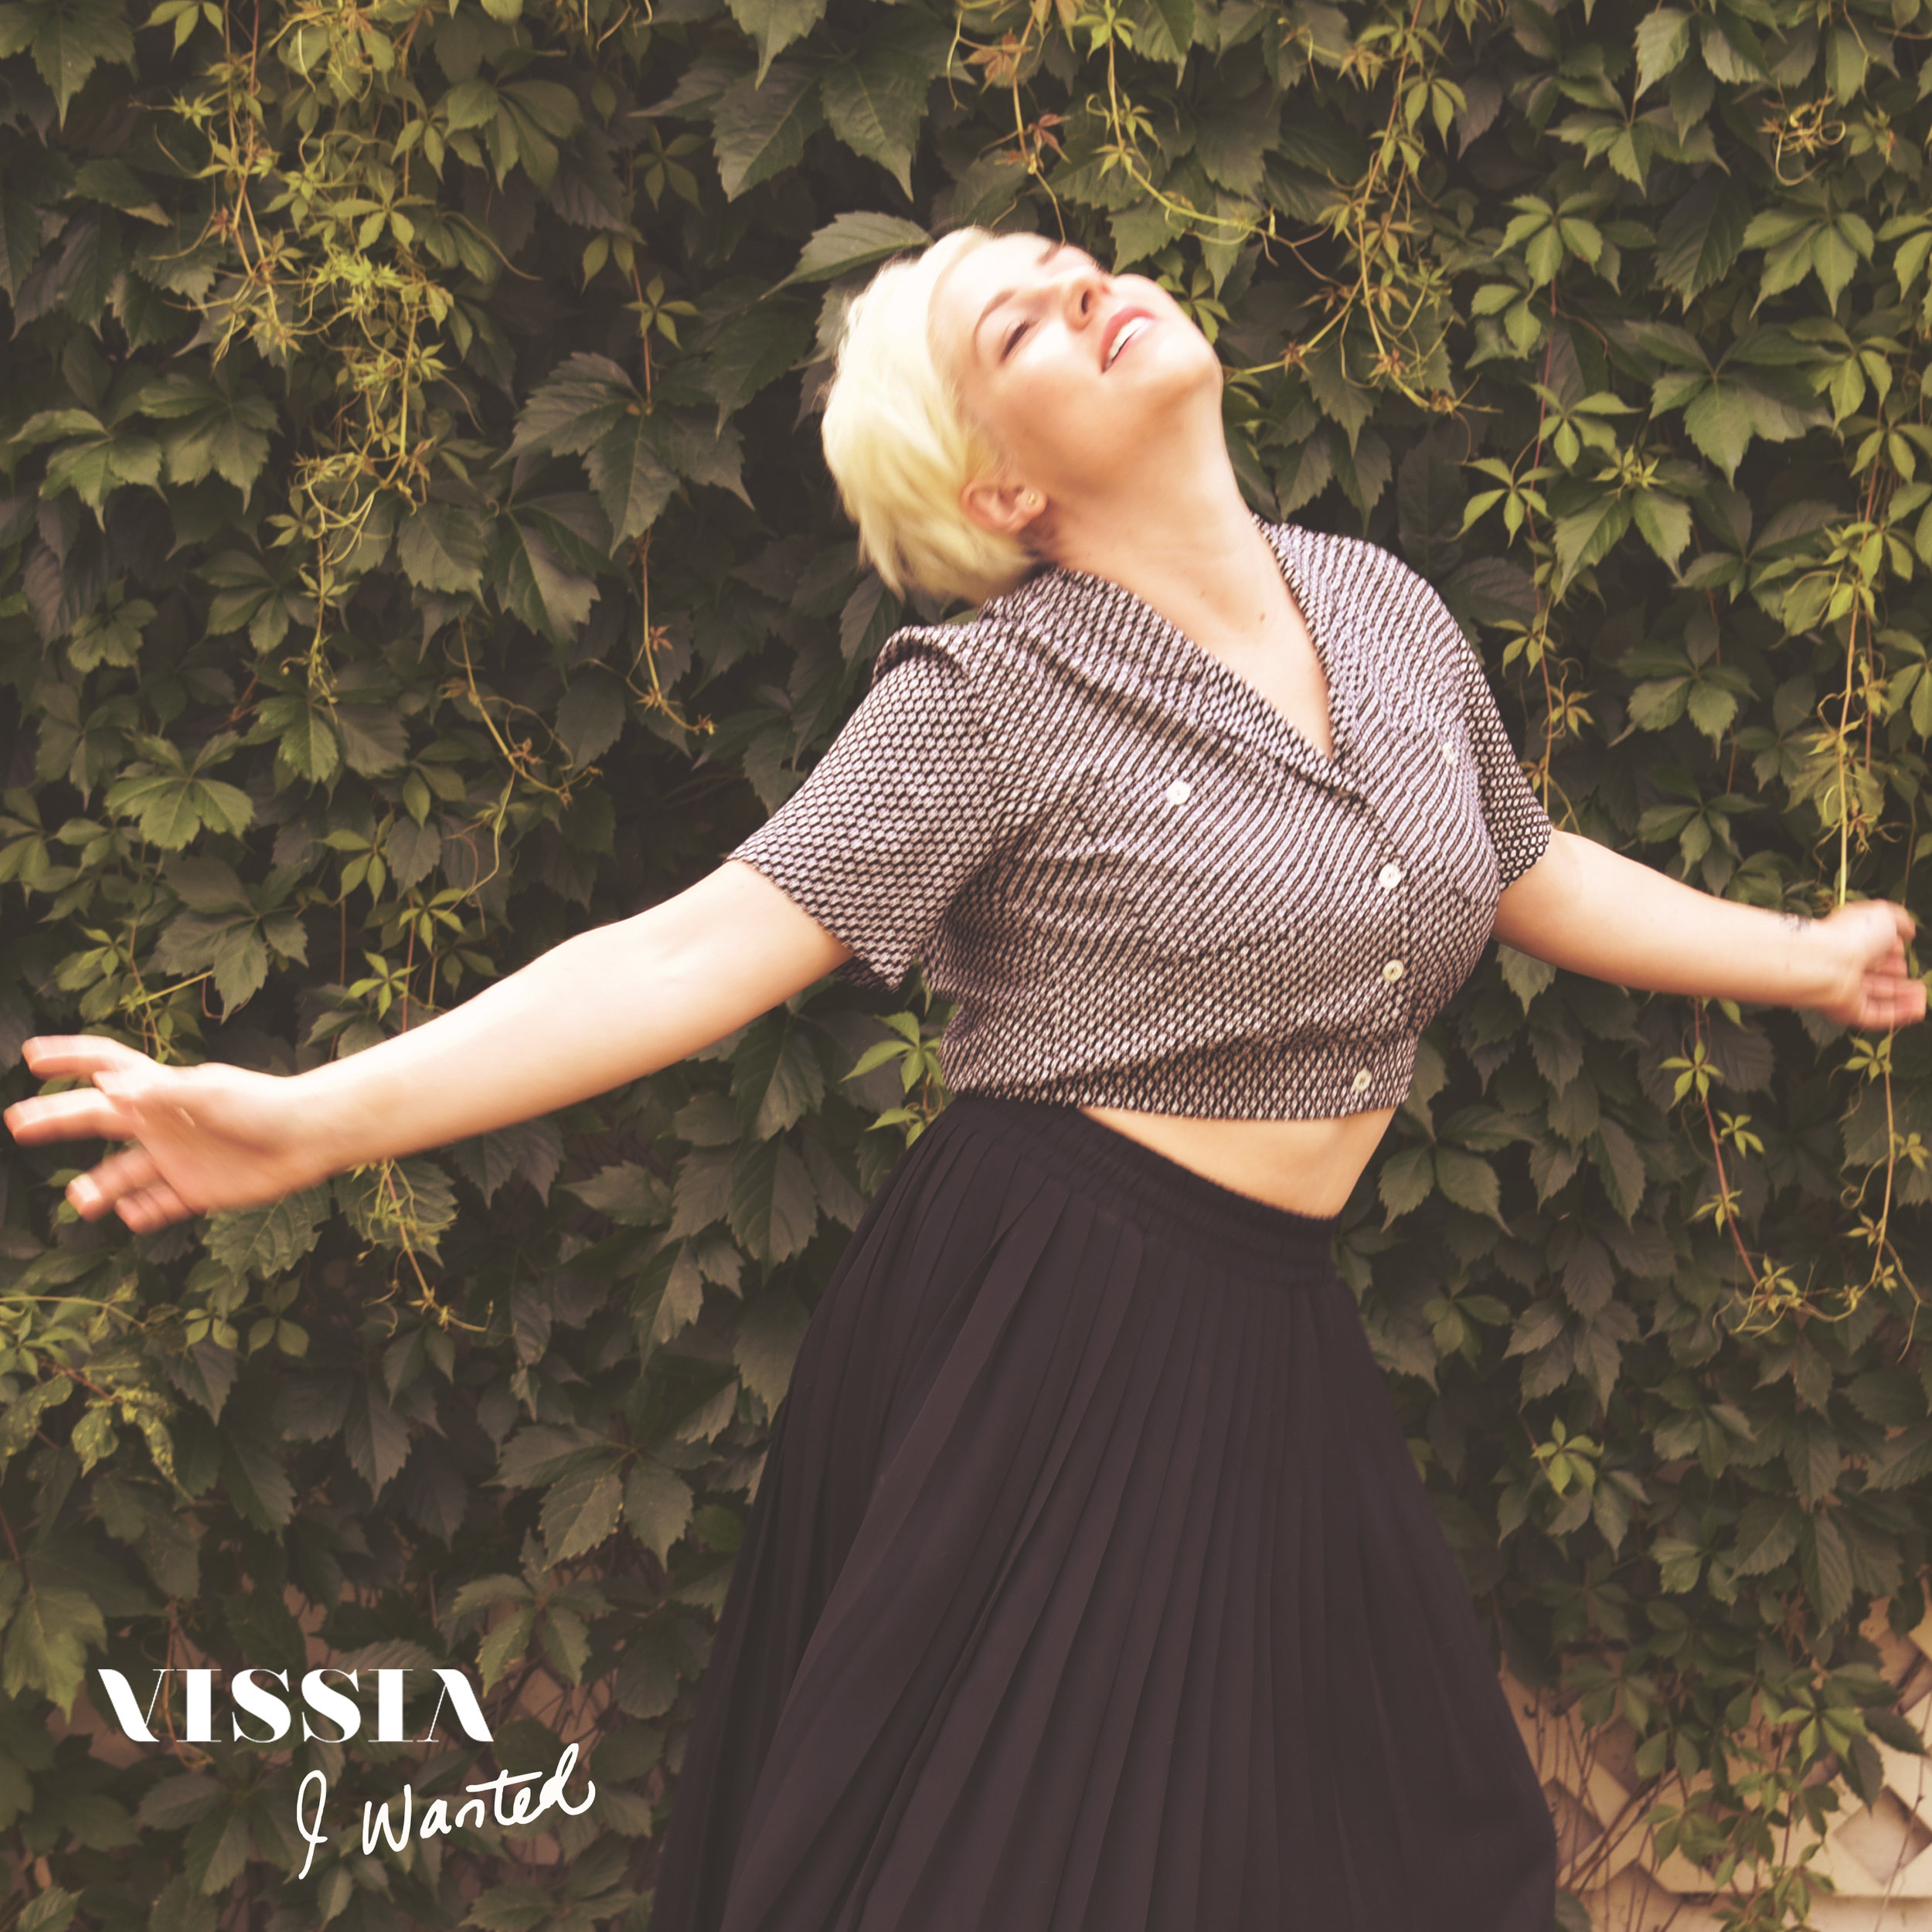 VISSIA - I Wanted - single.jpg